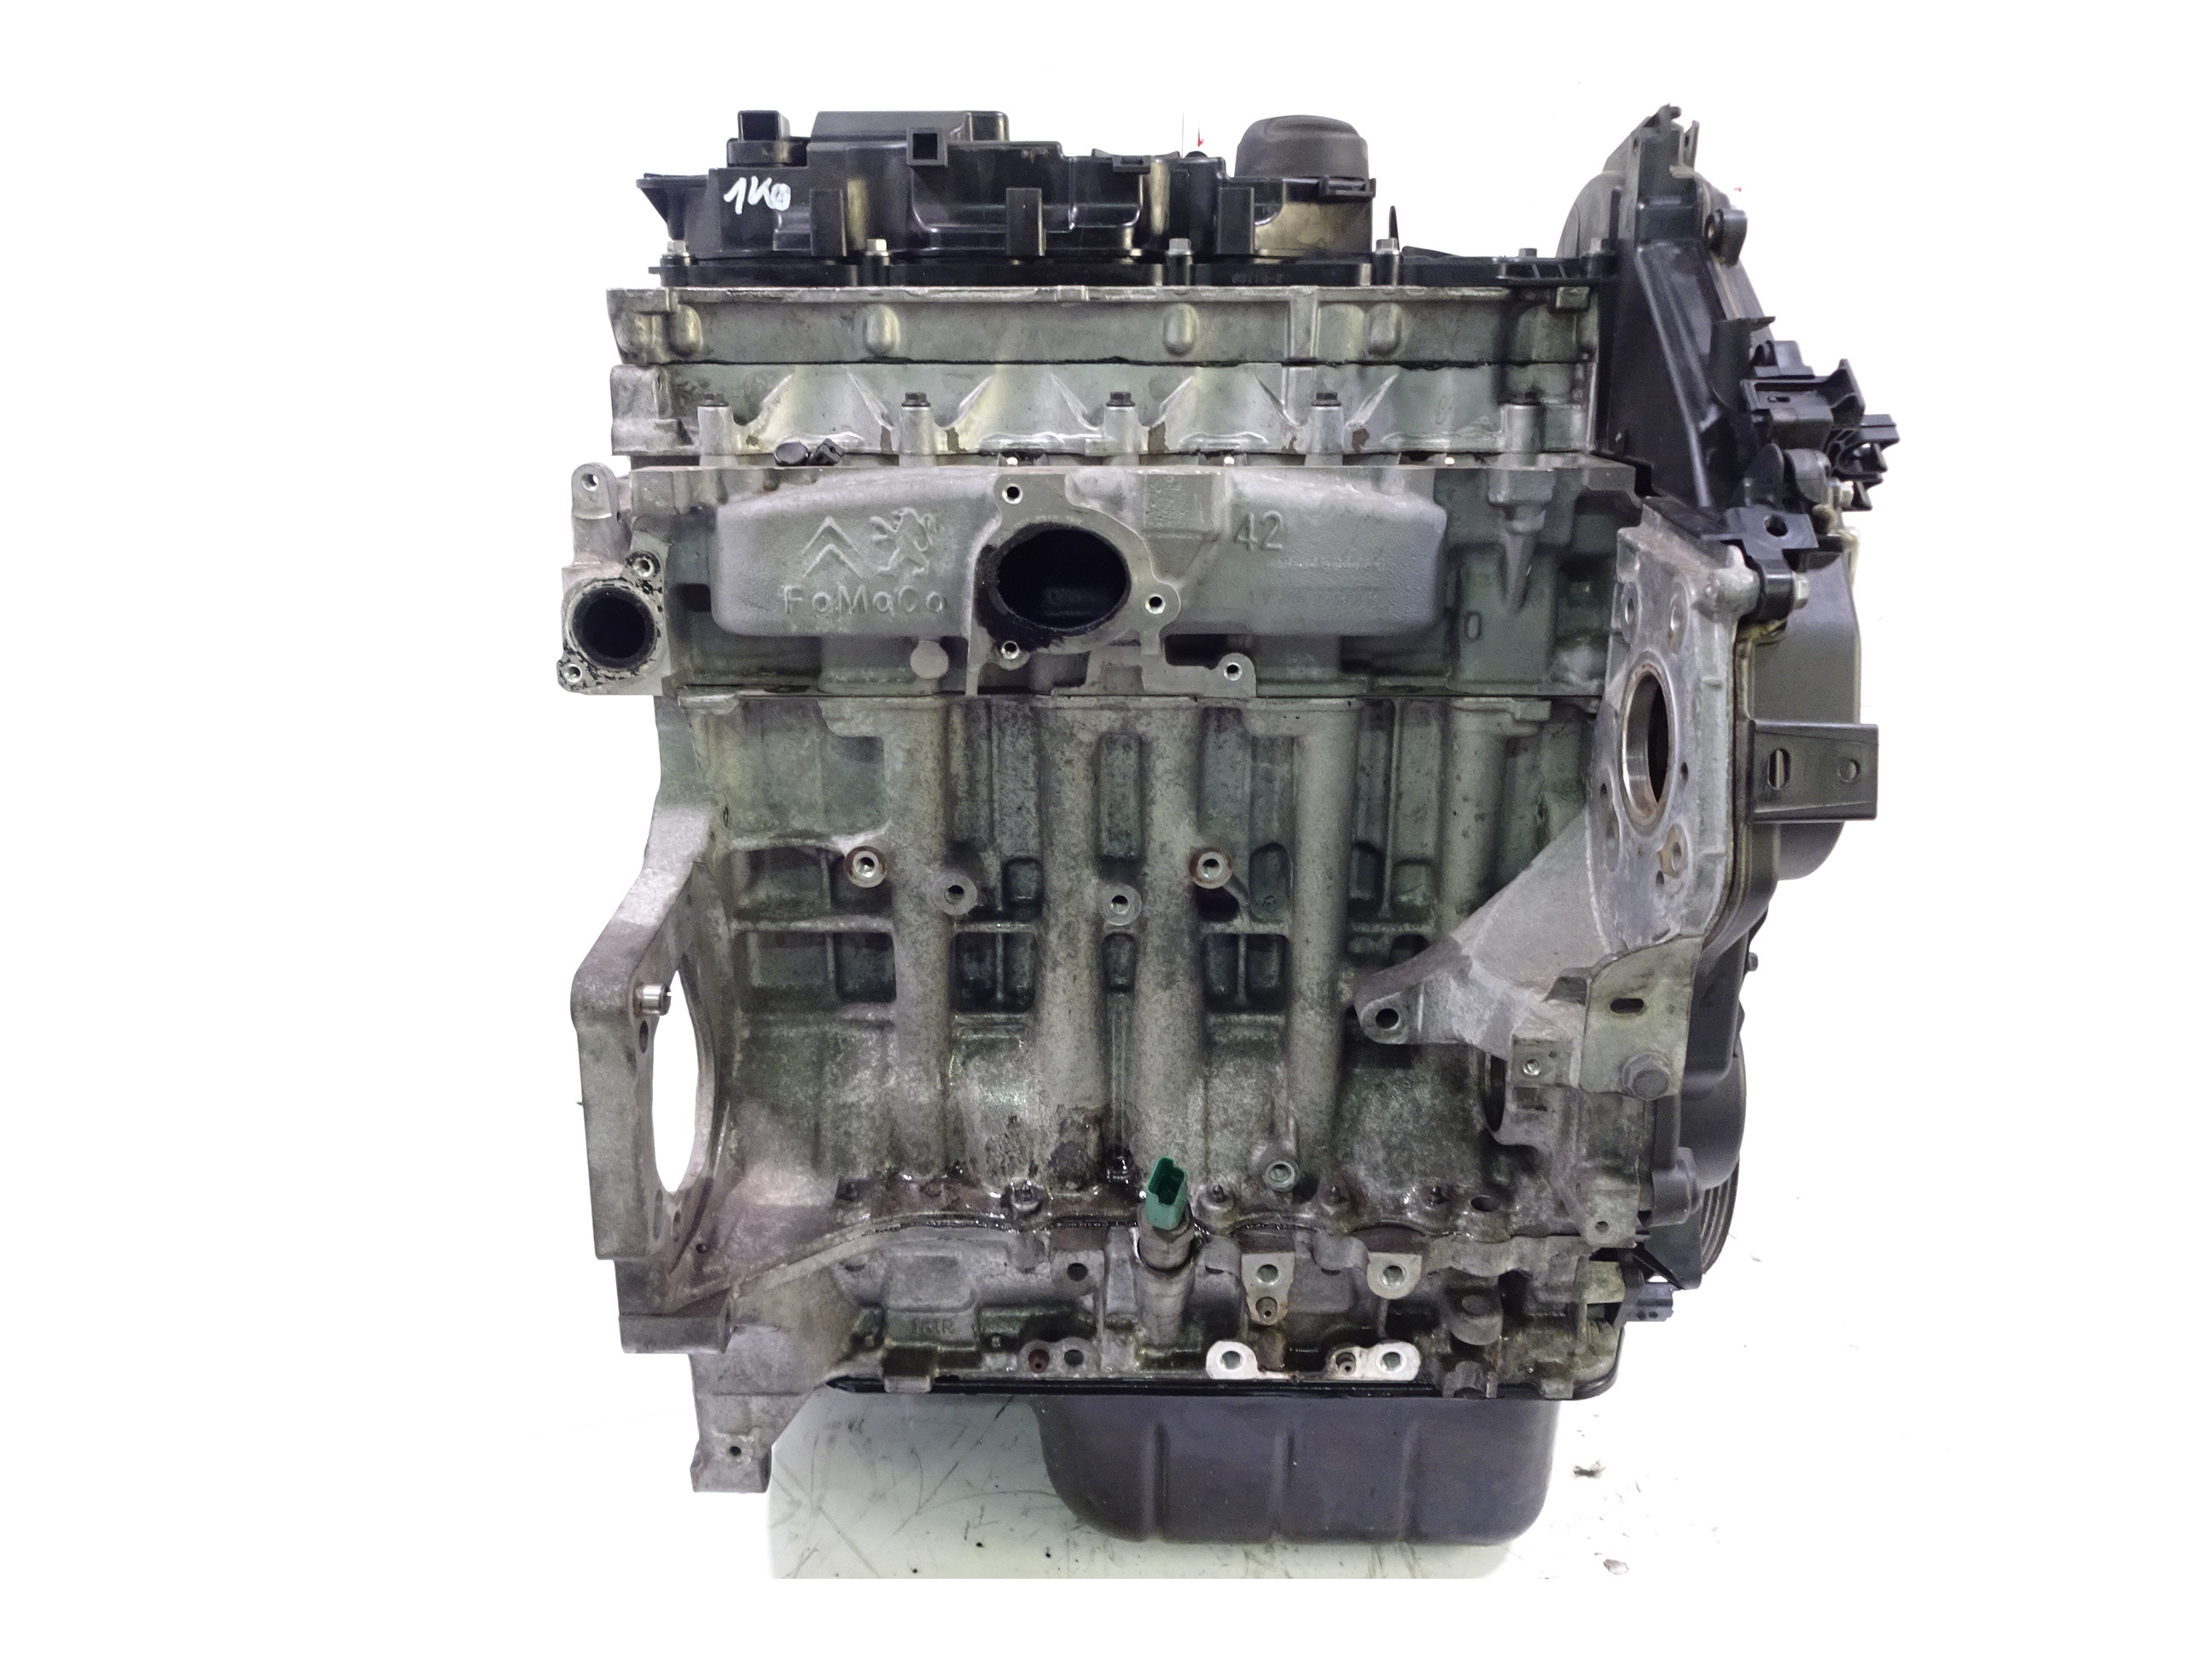 Motor 2012 Citroen Peugeot C3 C4 DS3 DS4 208 308 1,6 HDi Diesel 9HD DV6C 9H05